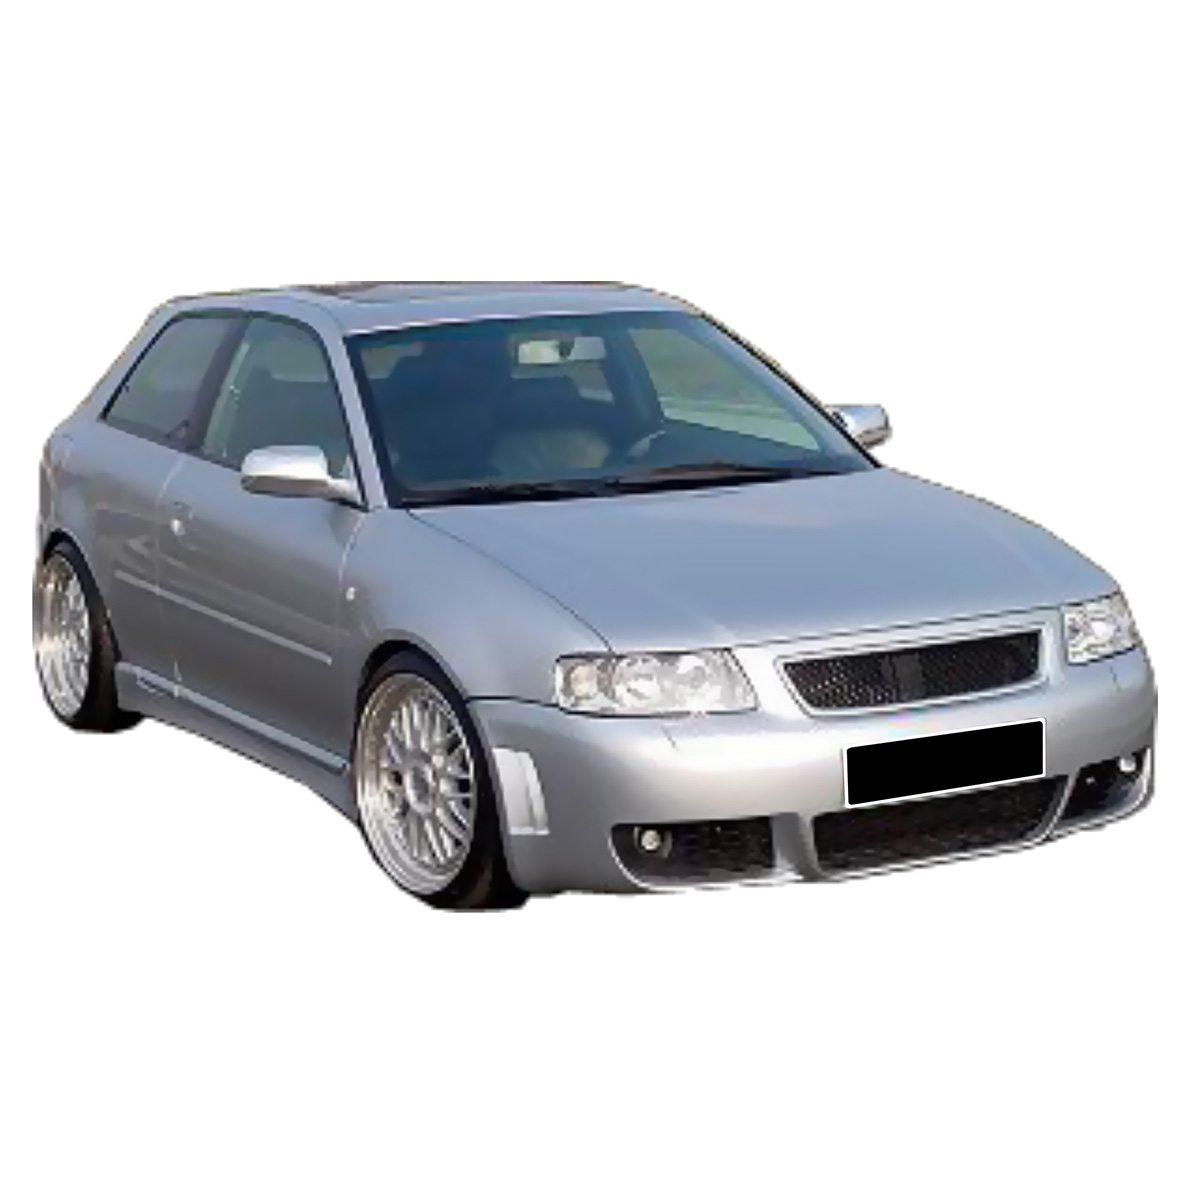 Audi-A3-96-01-Spark-Frt-PCU0020